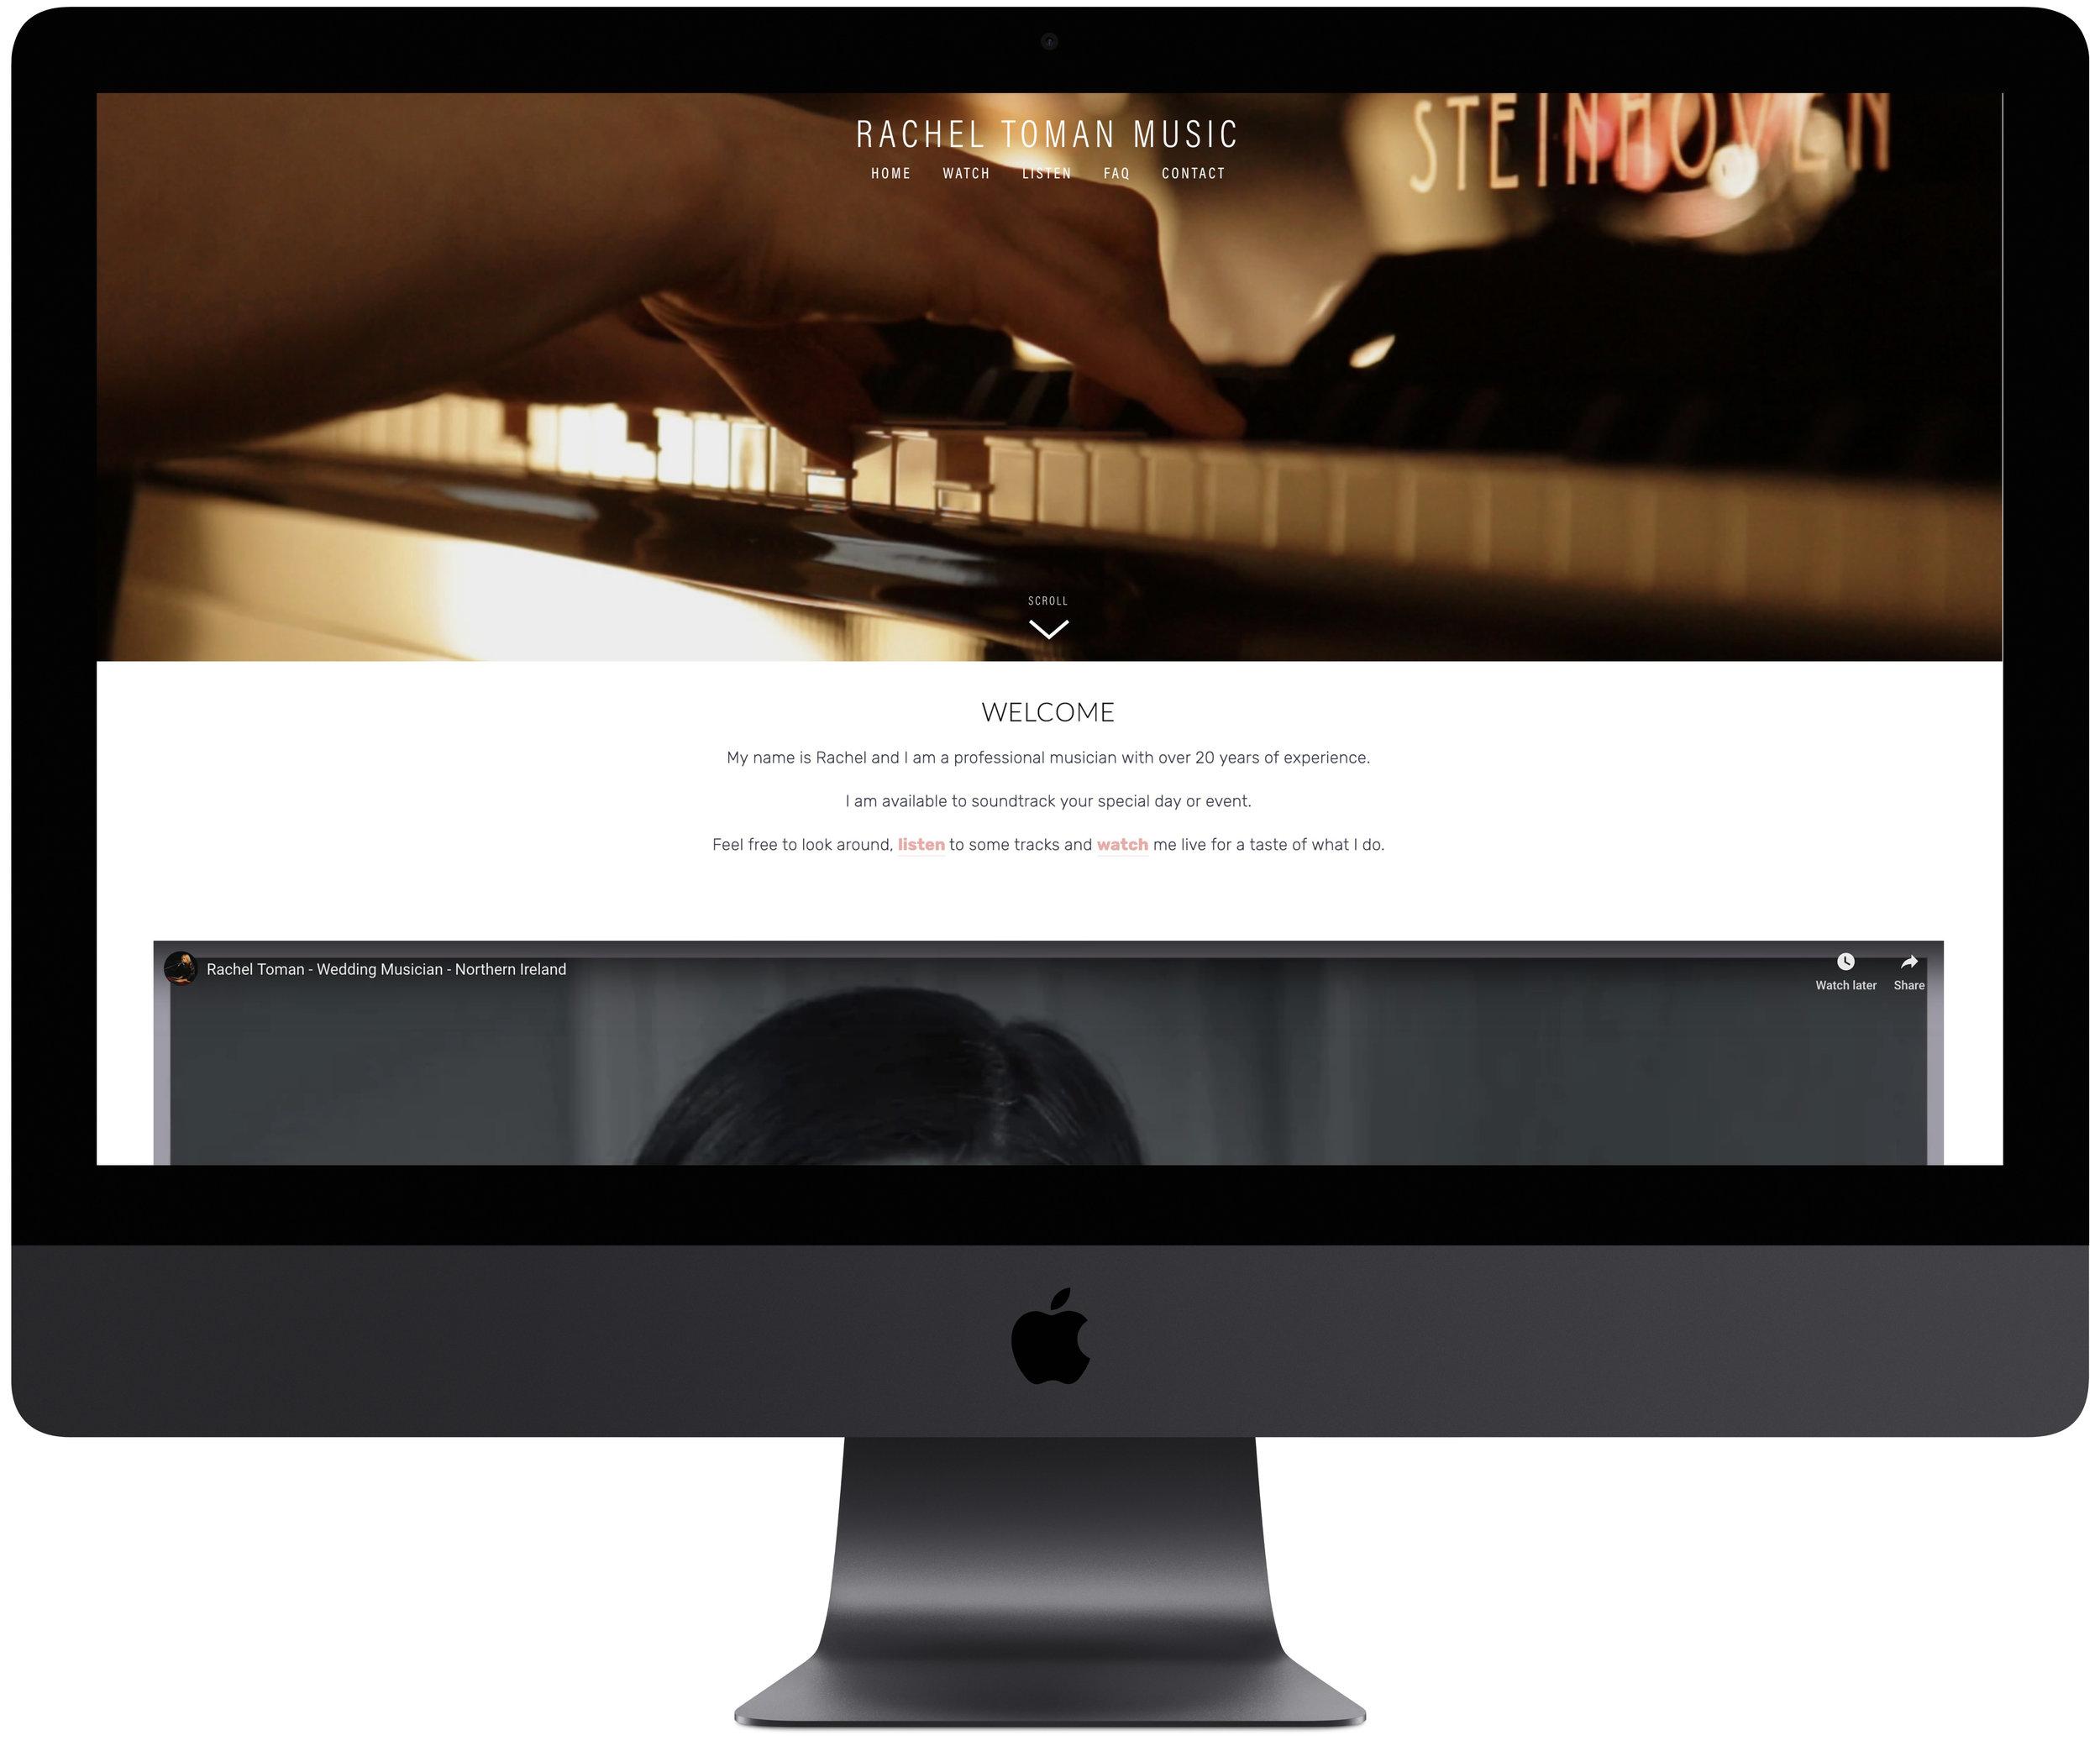 Rachel Toman - iMac Pro.jpg